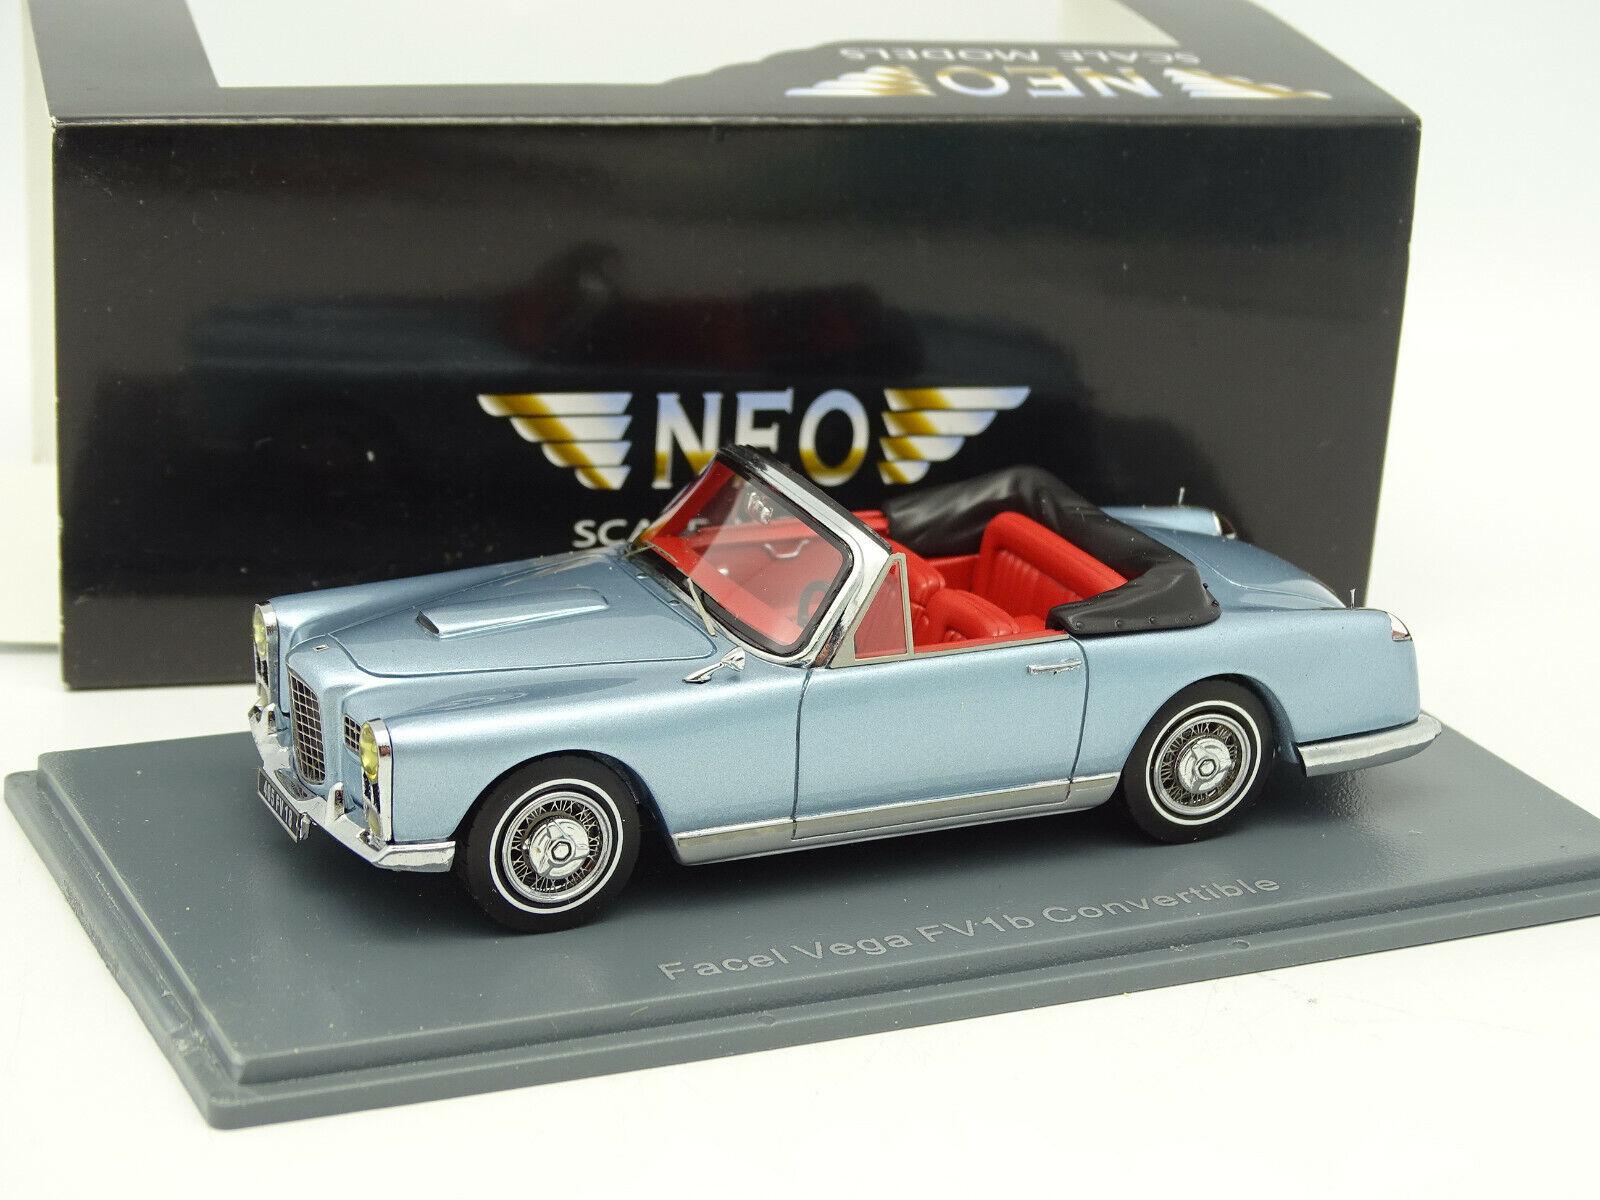 Neo 1 43 - Facel Vega FV 1B Congreenible bluee